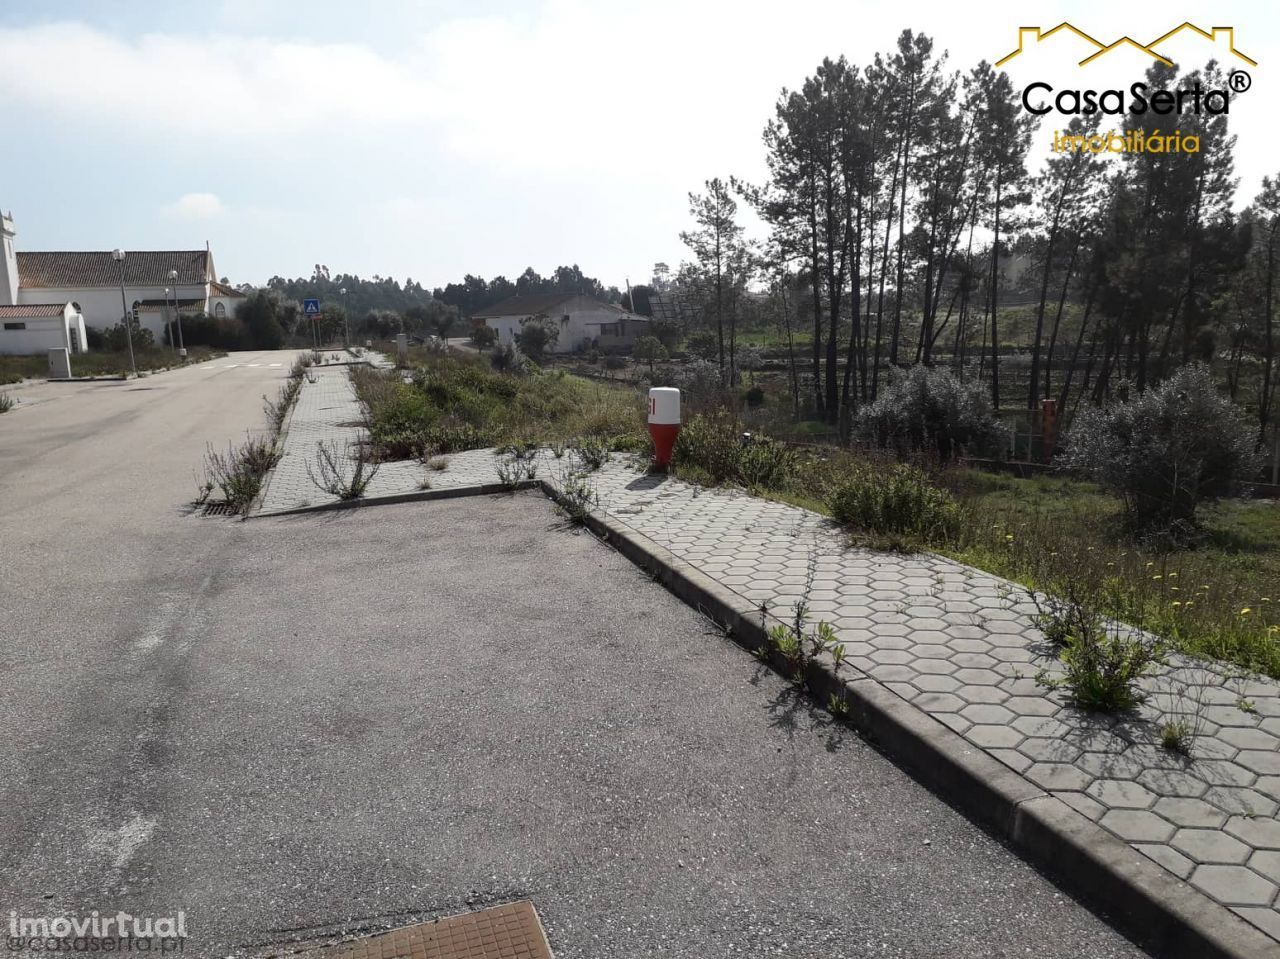 Terreno para comprar, Vila de Rei, Castelo Branco - Foto 1